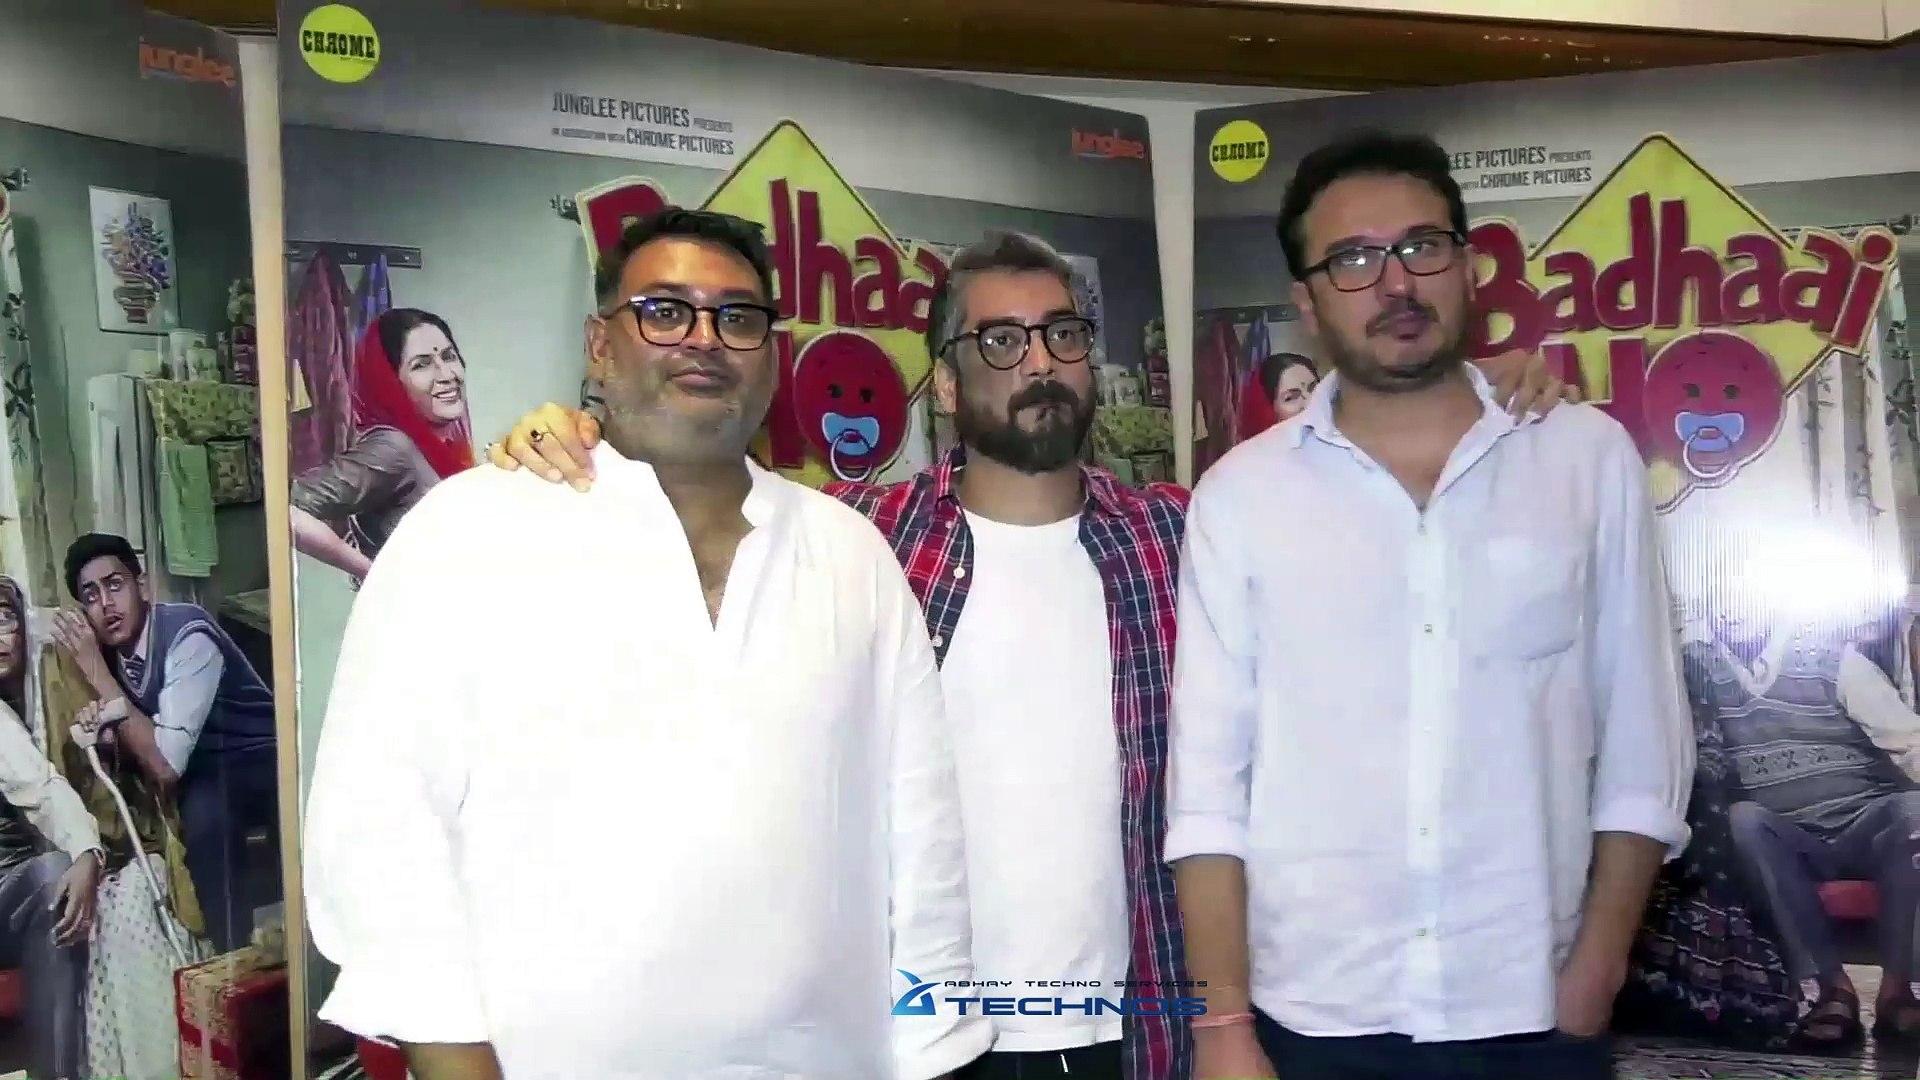 Interview Of Amit Ravindranath Sharma, Shantanu & Akshat For Success Of Badhaai Ho